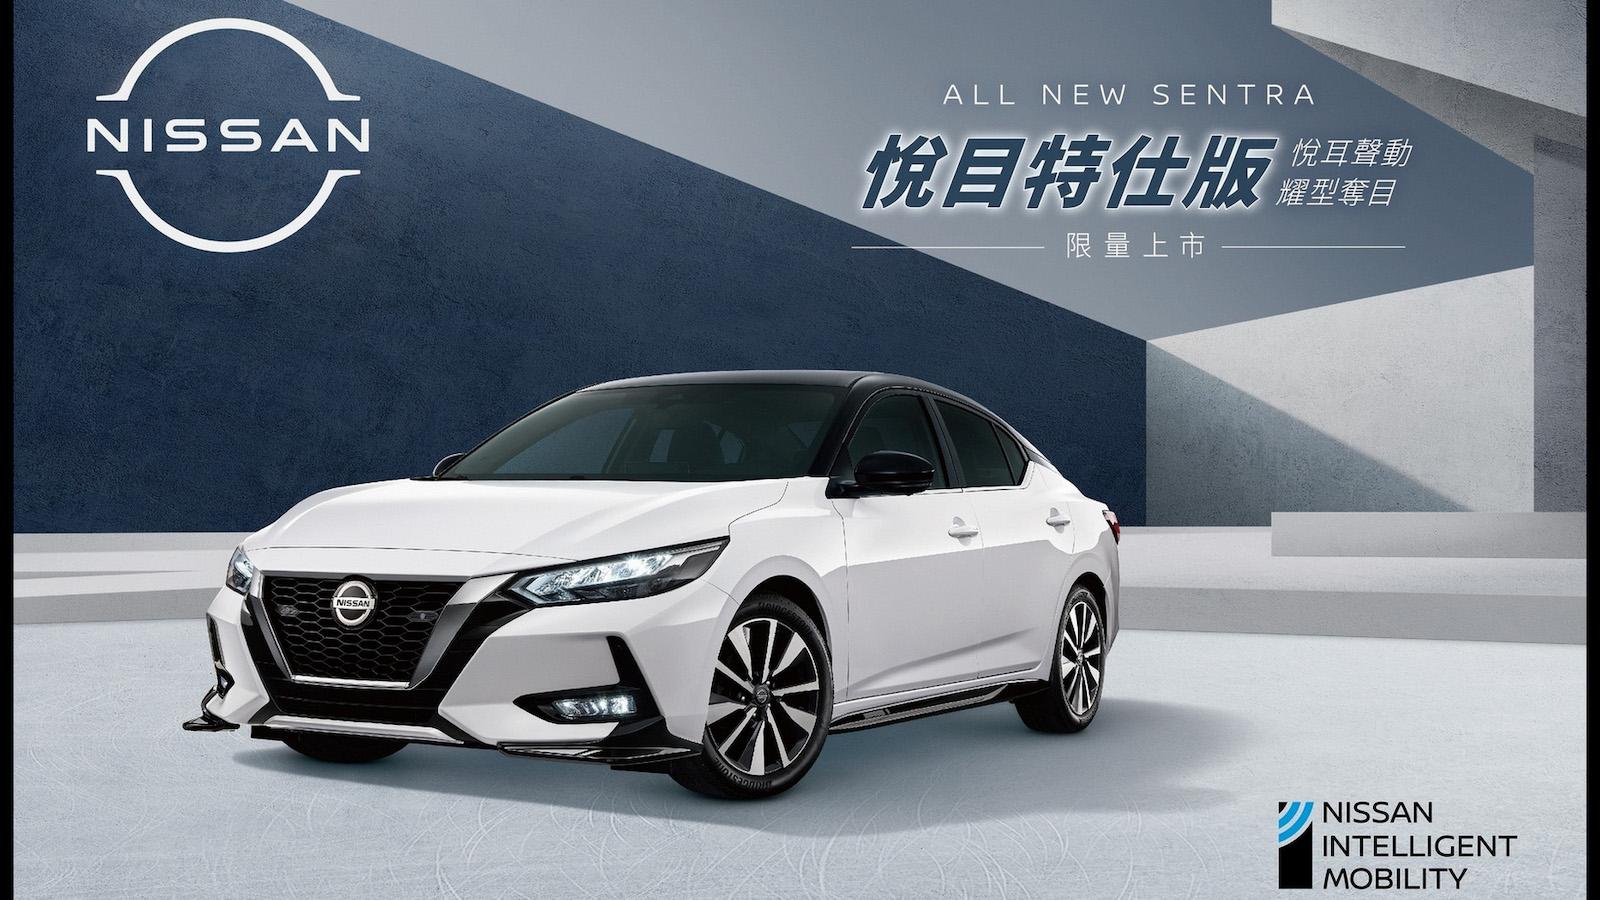 Nissan Sentra 悅目特仕版首波兩週完售,再追加 200 台升級三大優惠